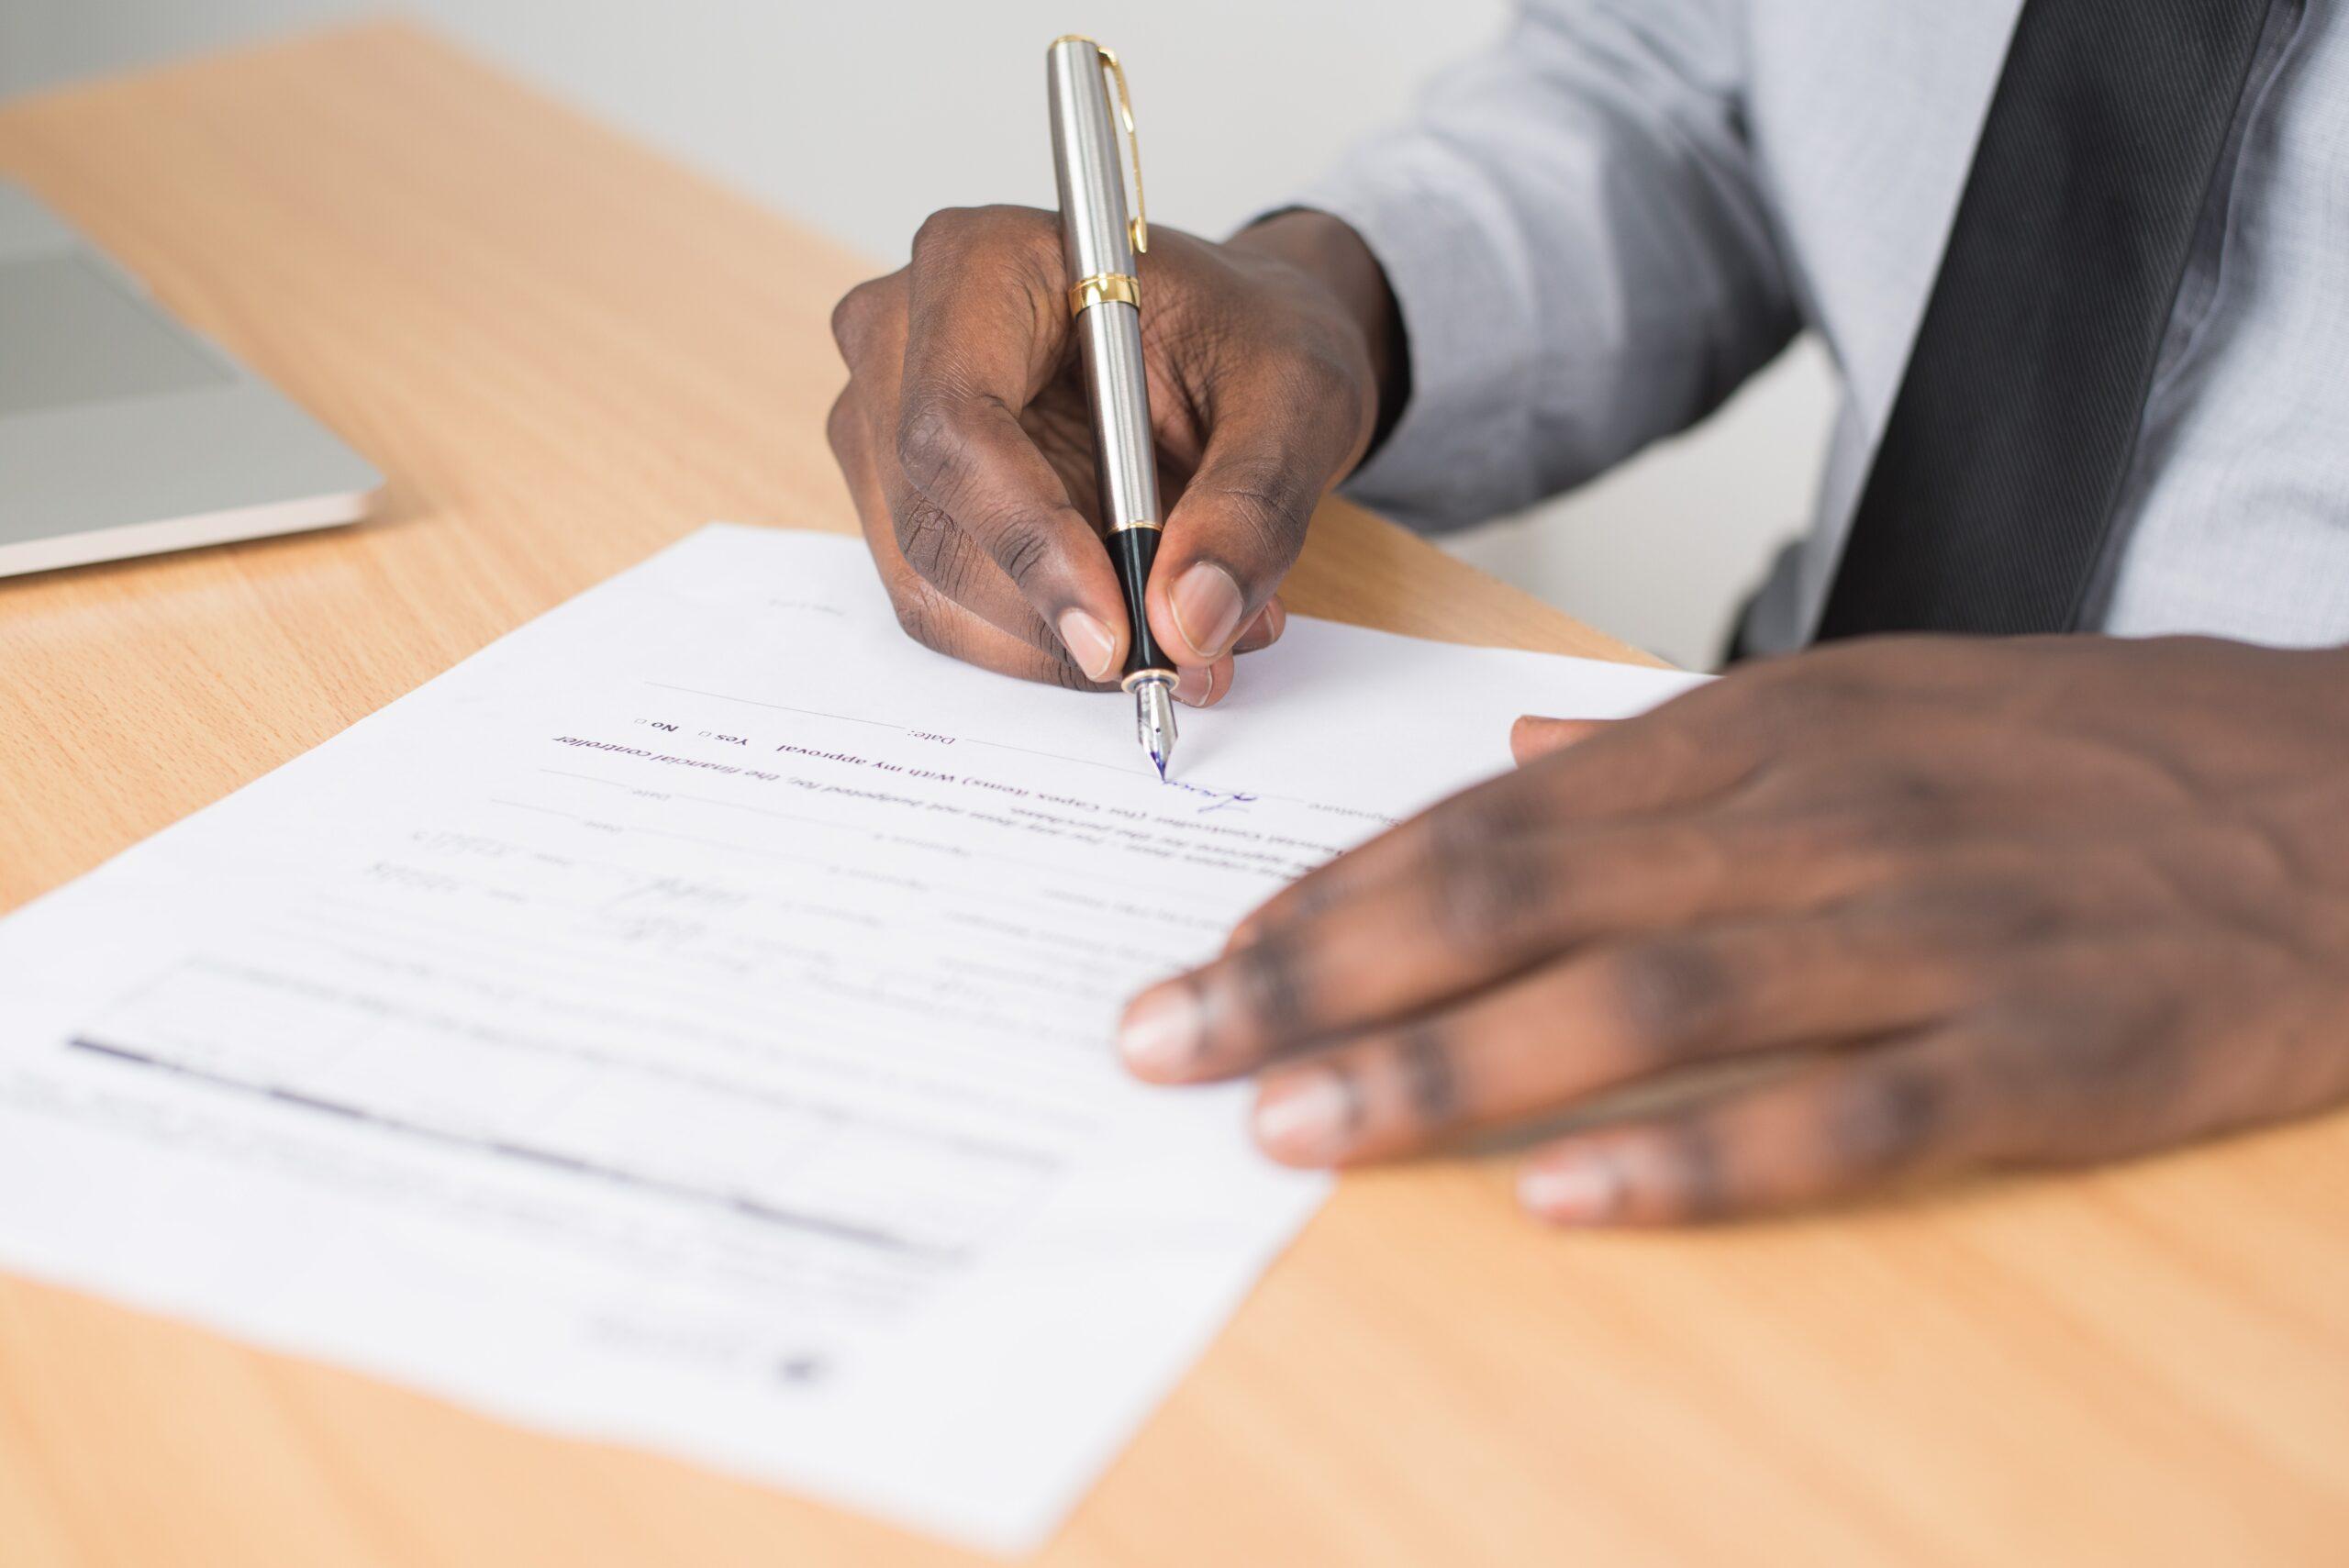 contratación de trabajadores no residentes en Francia